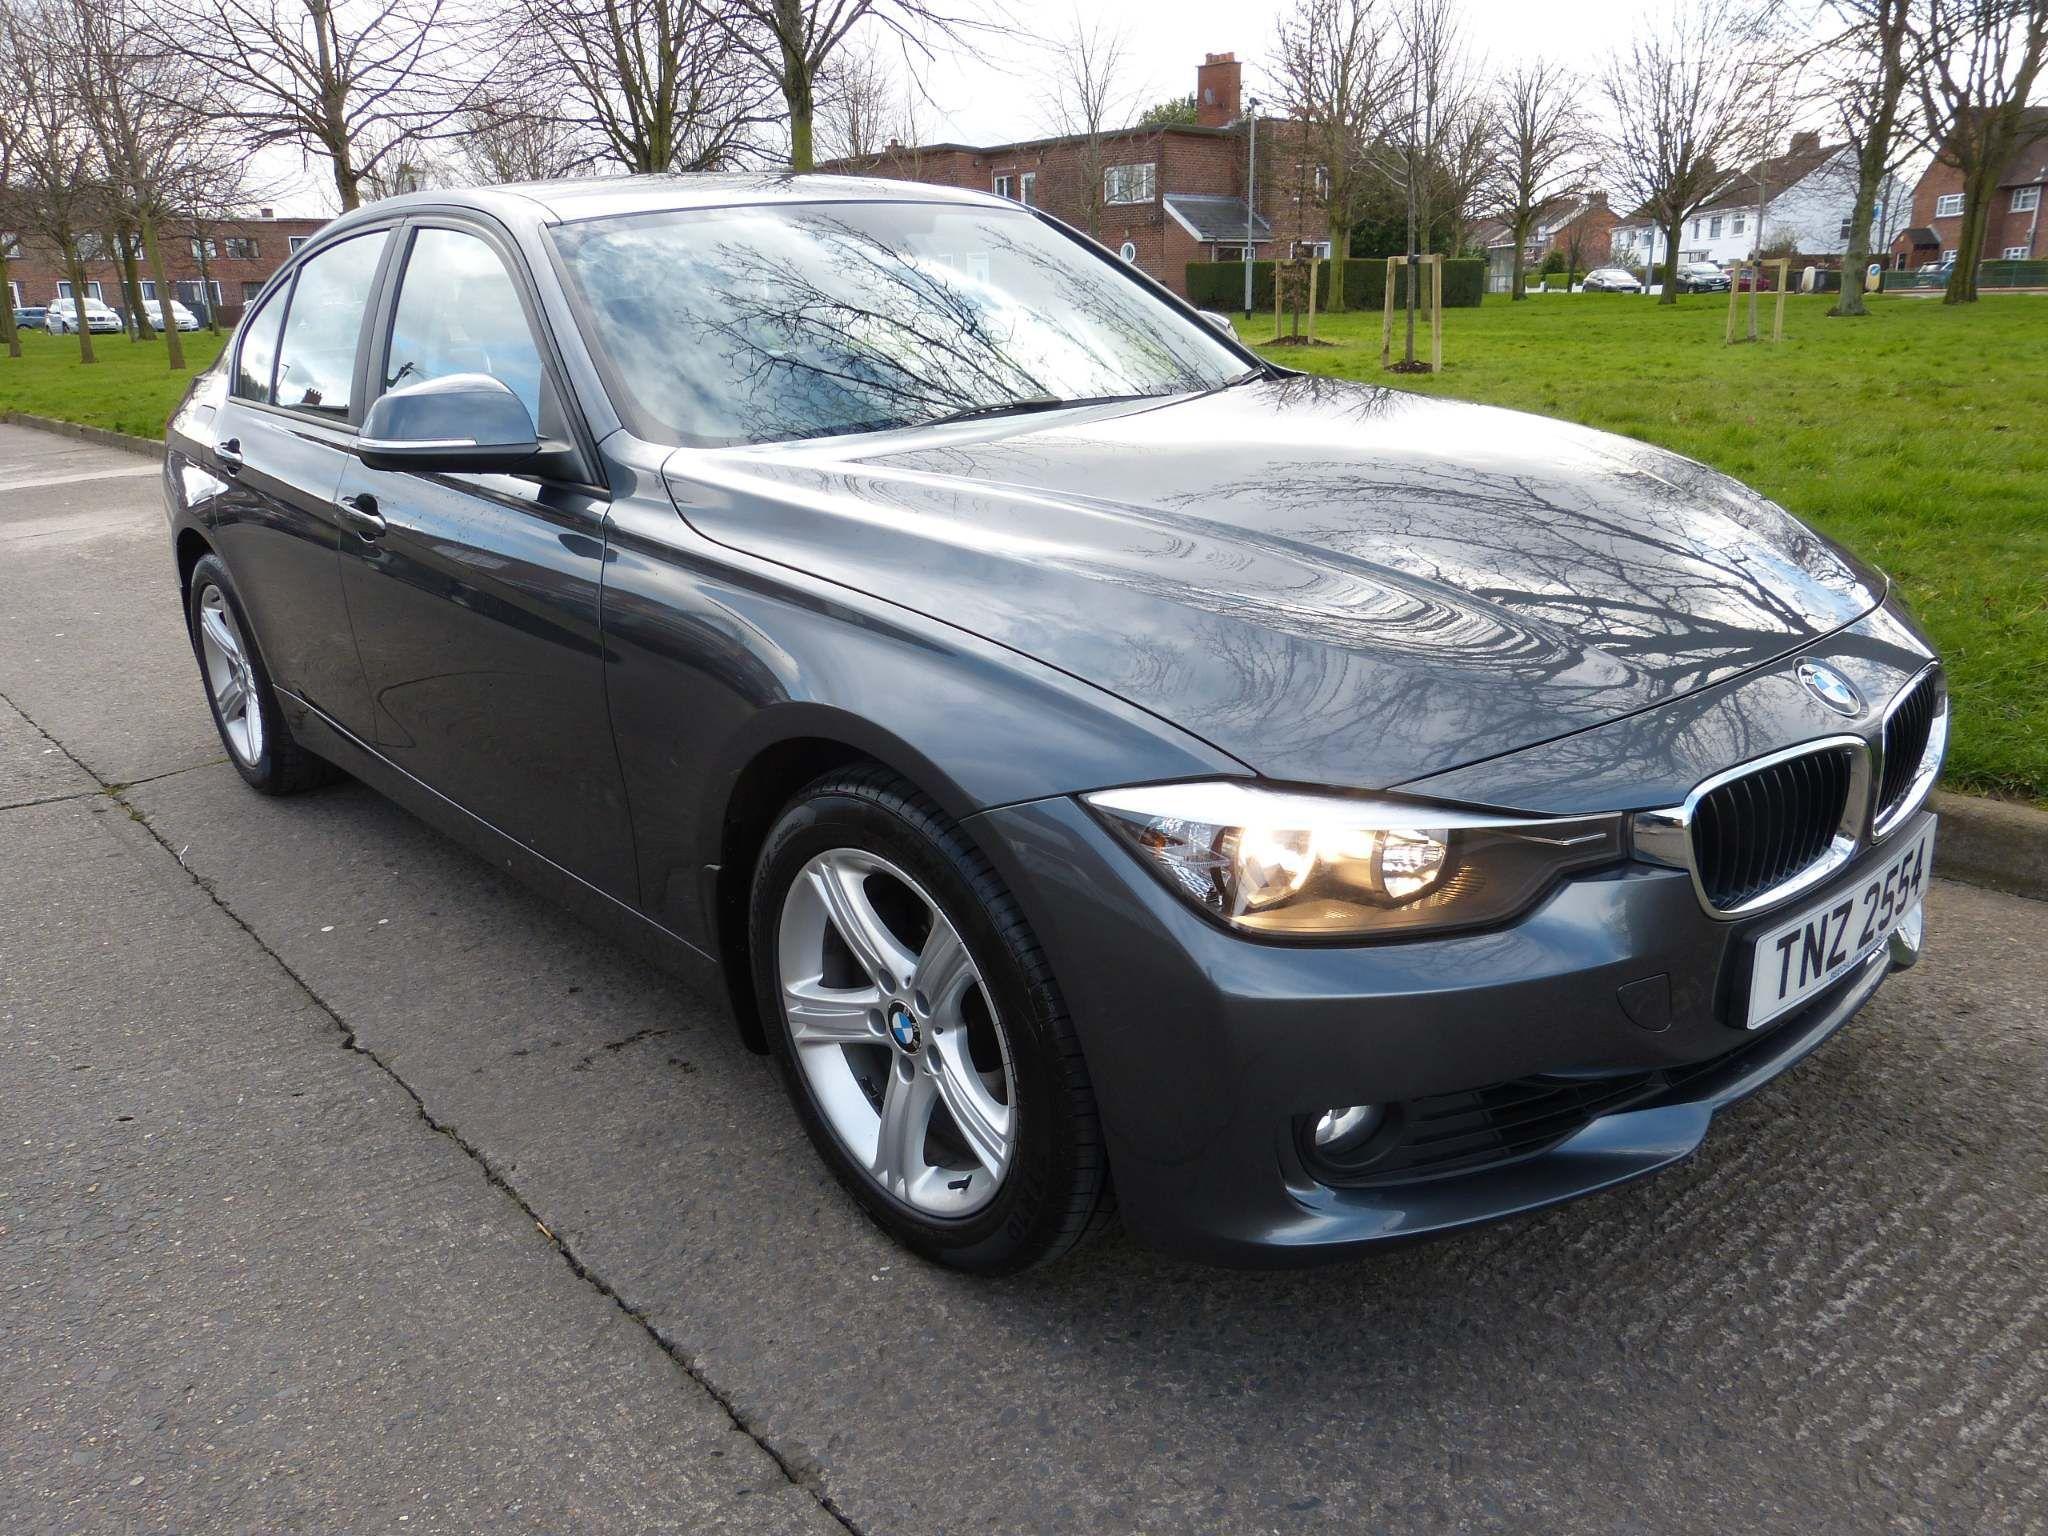 2013 BMW 3 Series 2.0 320i SE (s/s) Petrol Manual low milage – Beechlawn Motors Belfast